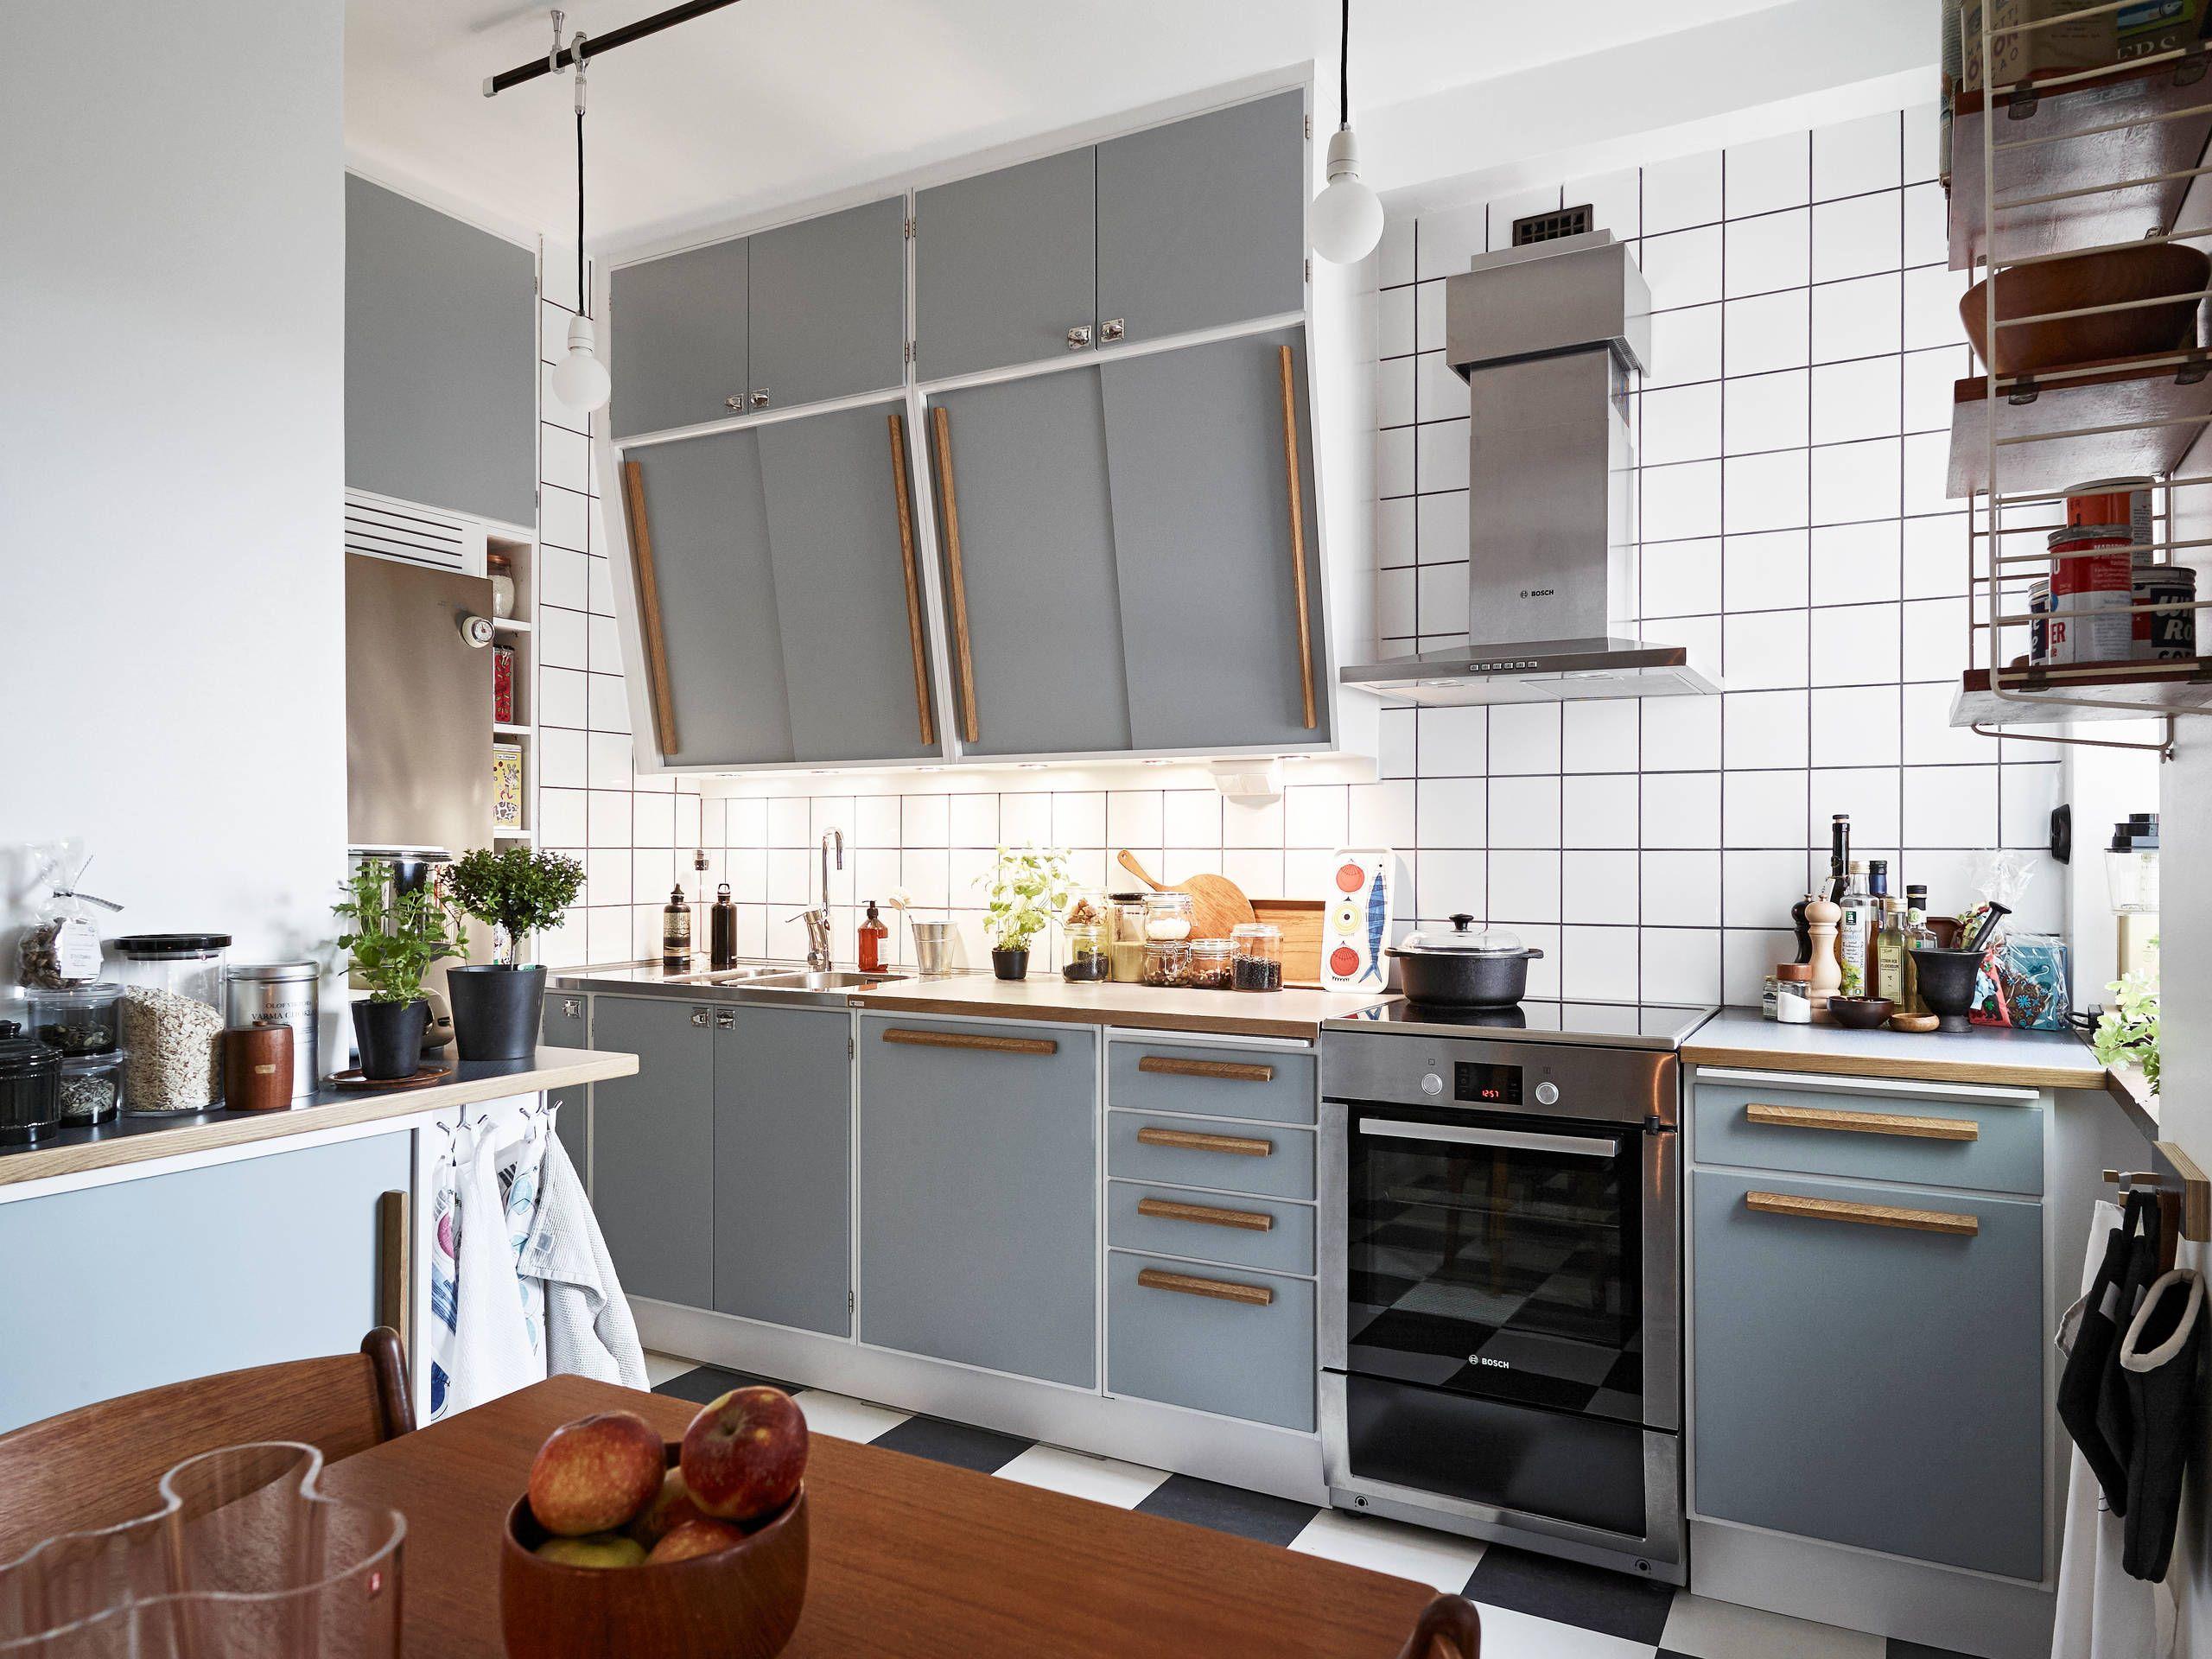 Retro kitchens, retro and modern on pinterest